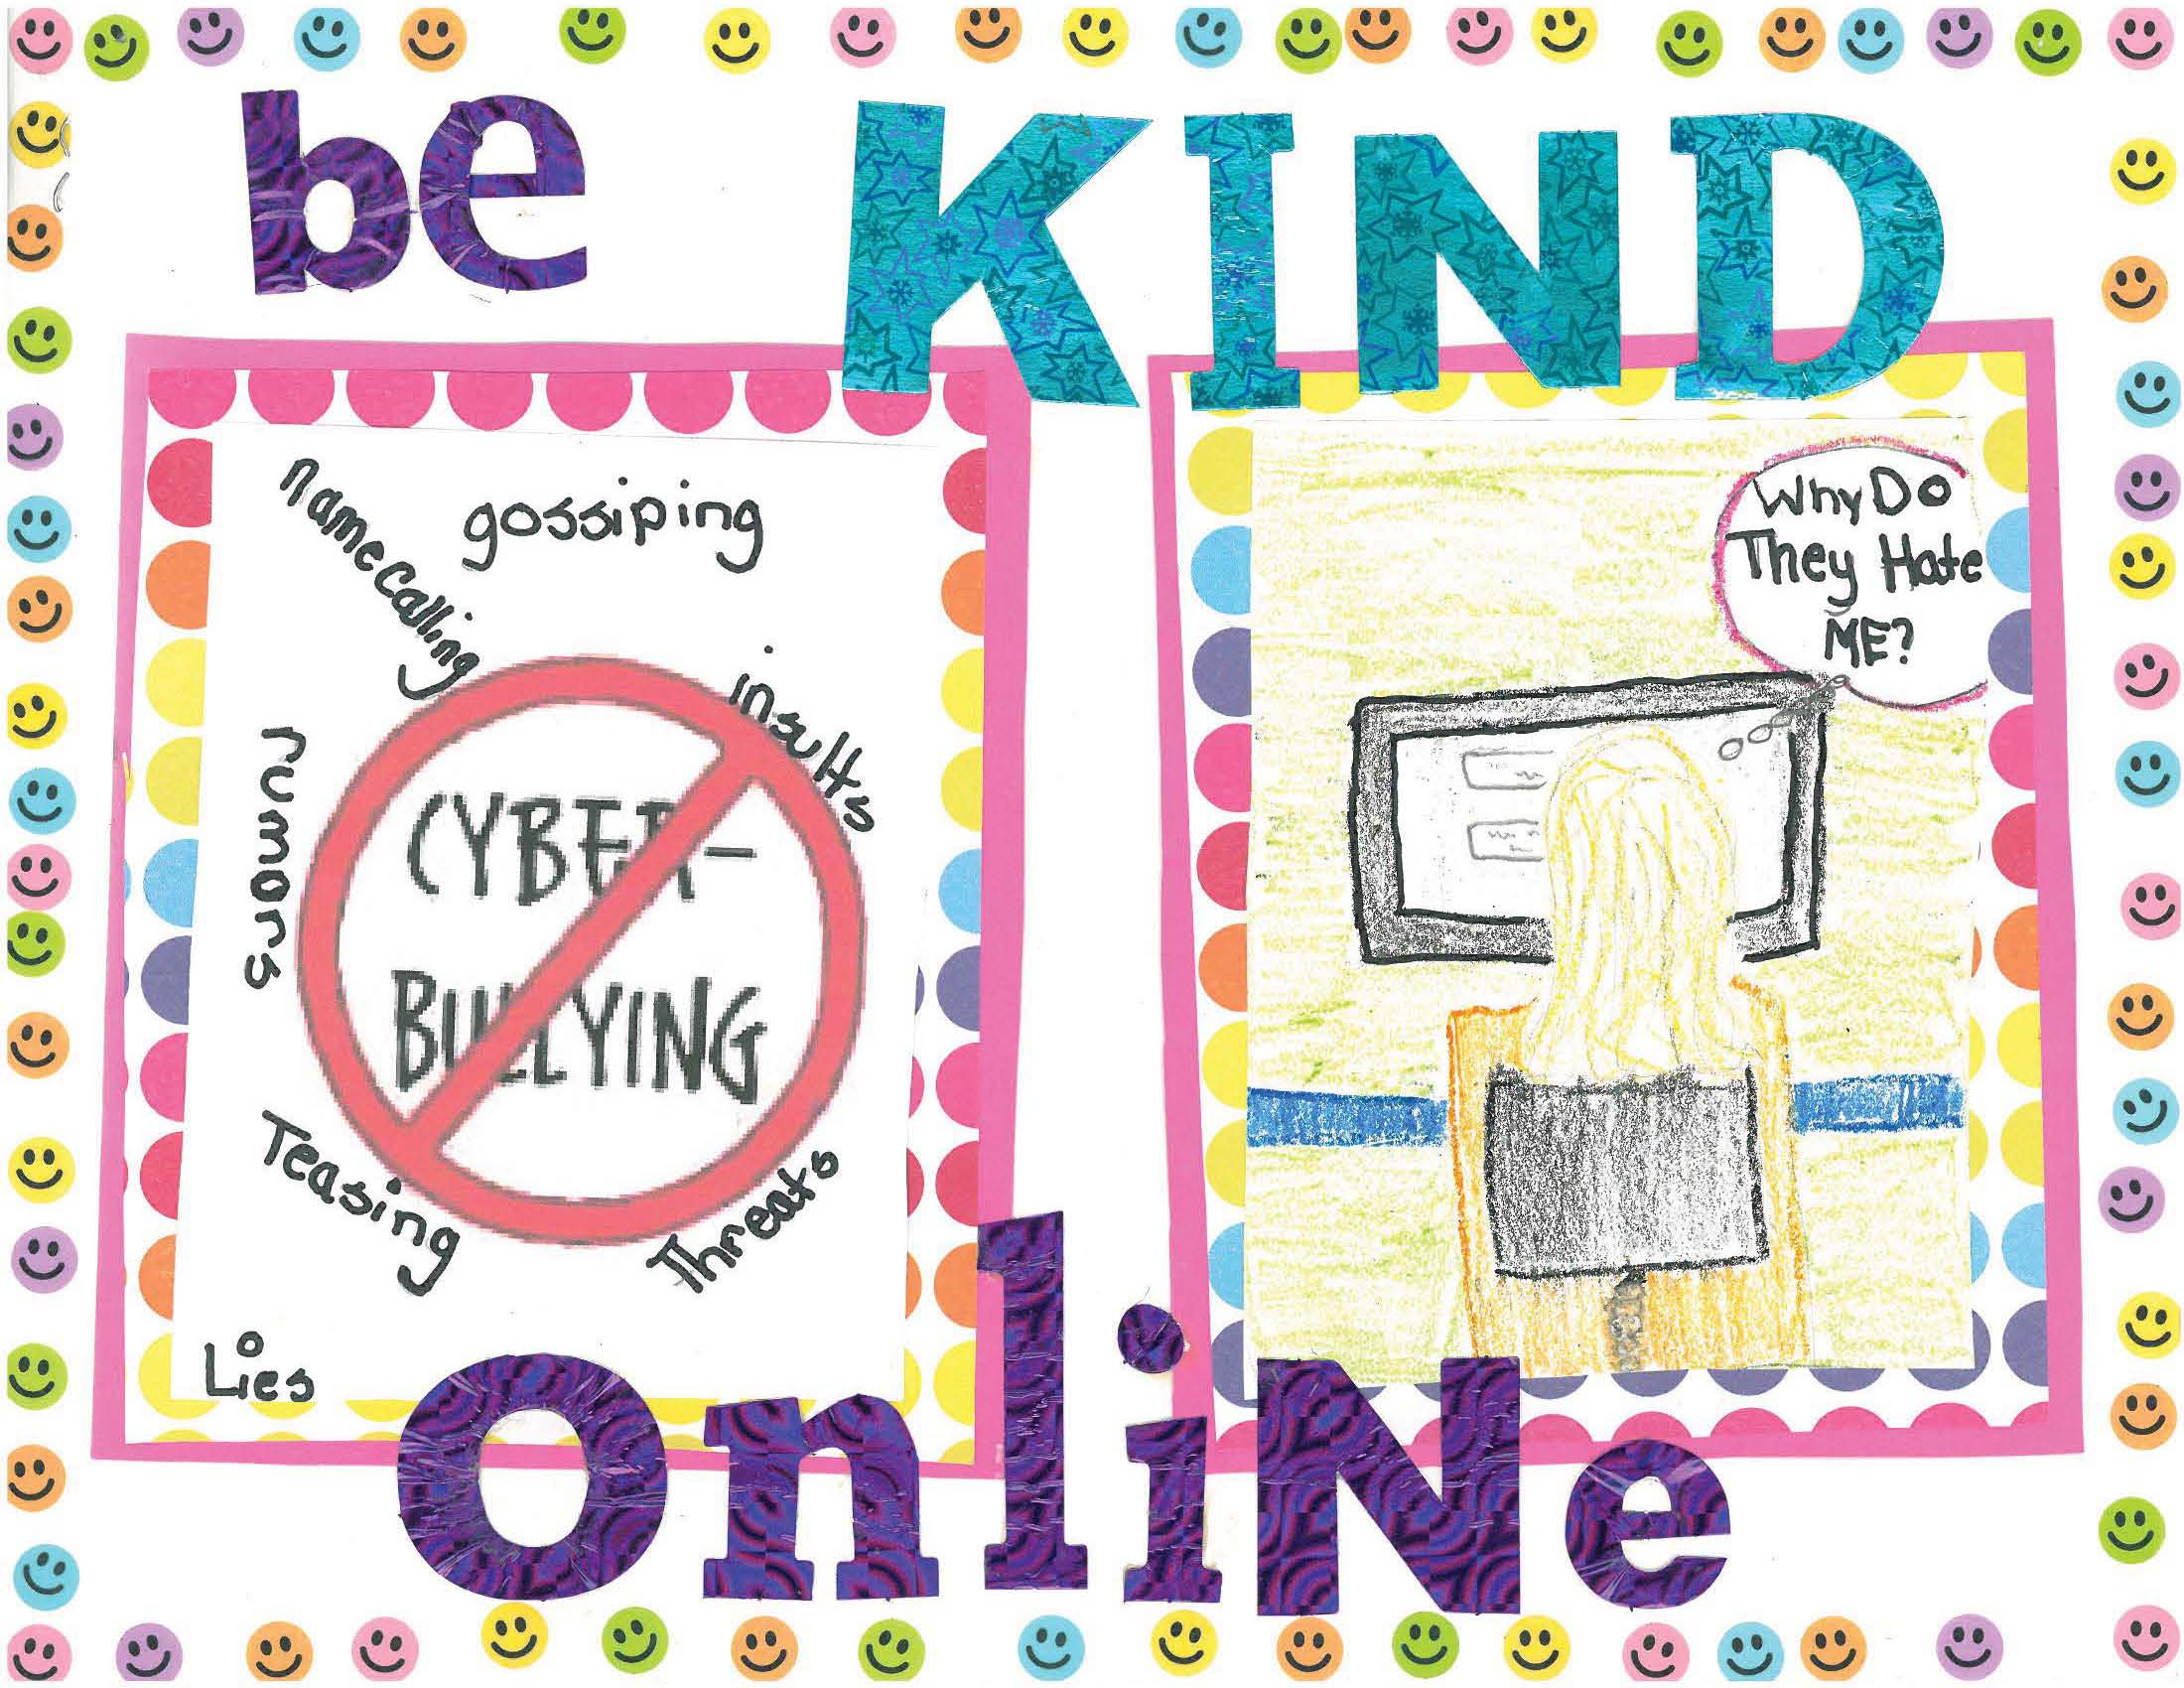 Drawn poster cyberbullying Cyberbullying Poster: on best Cyberbullying